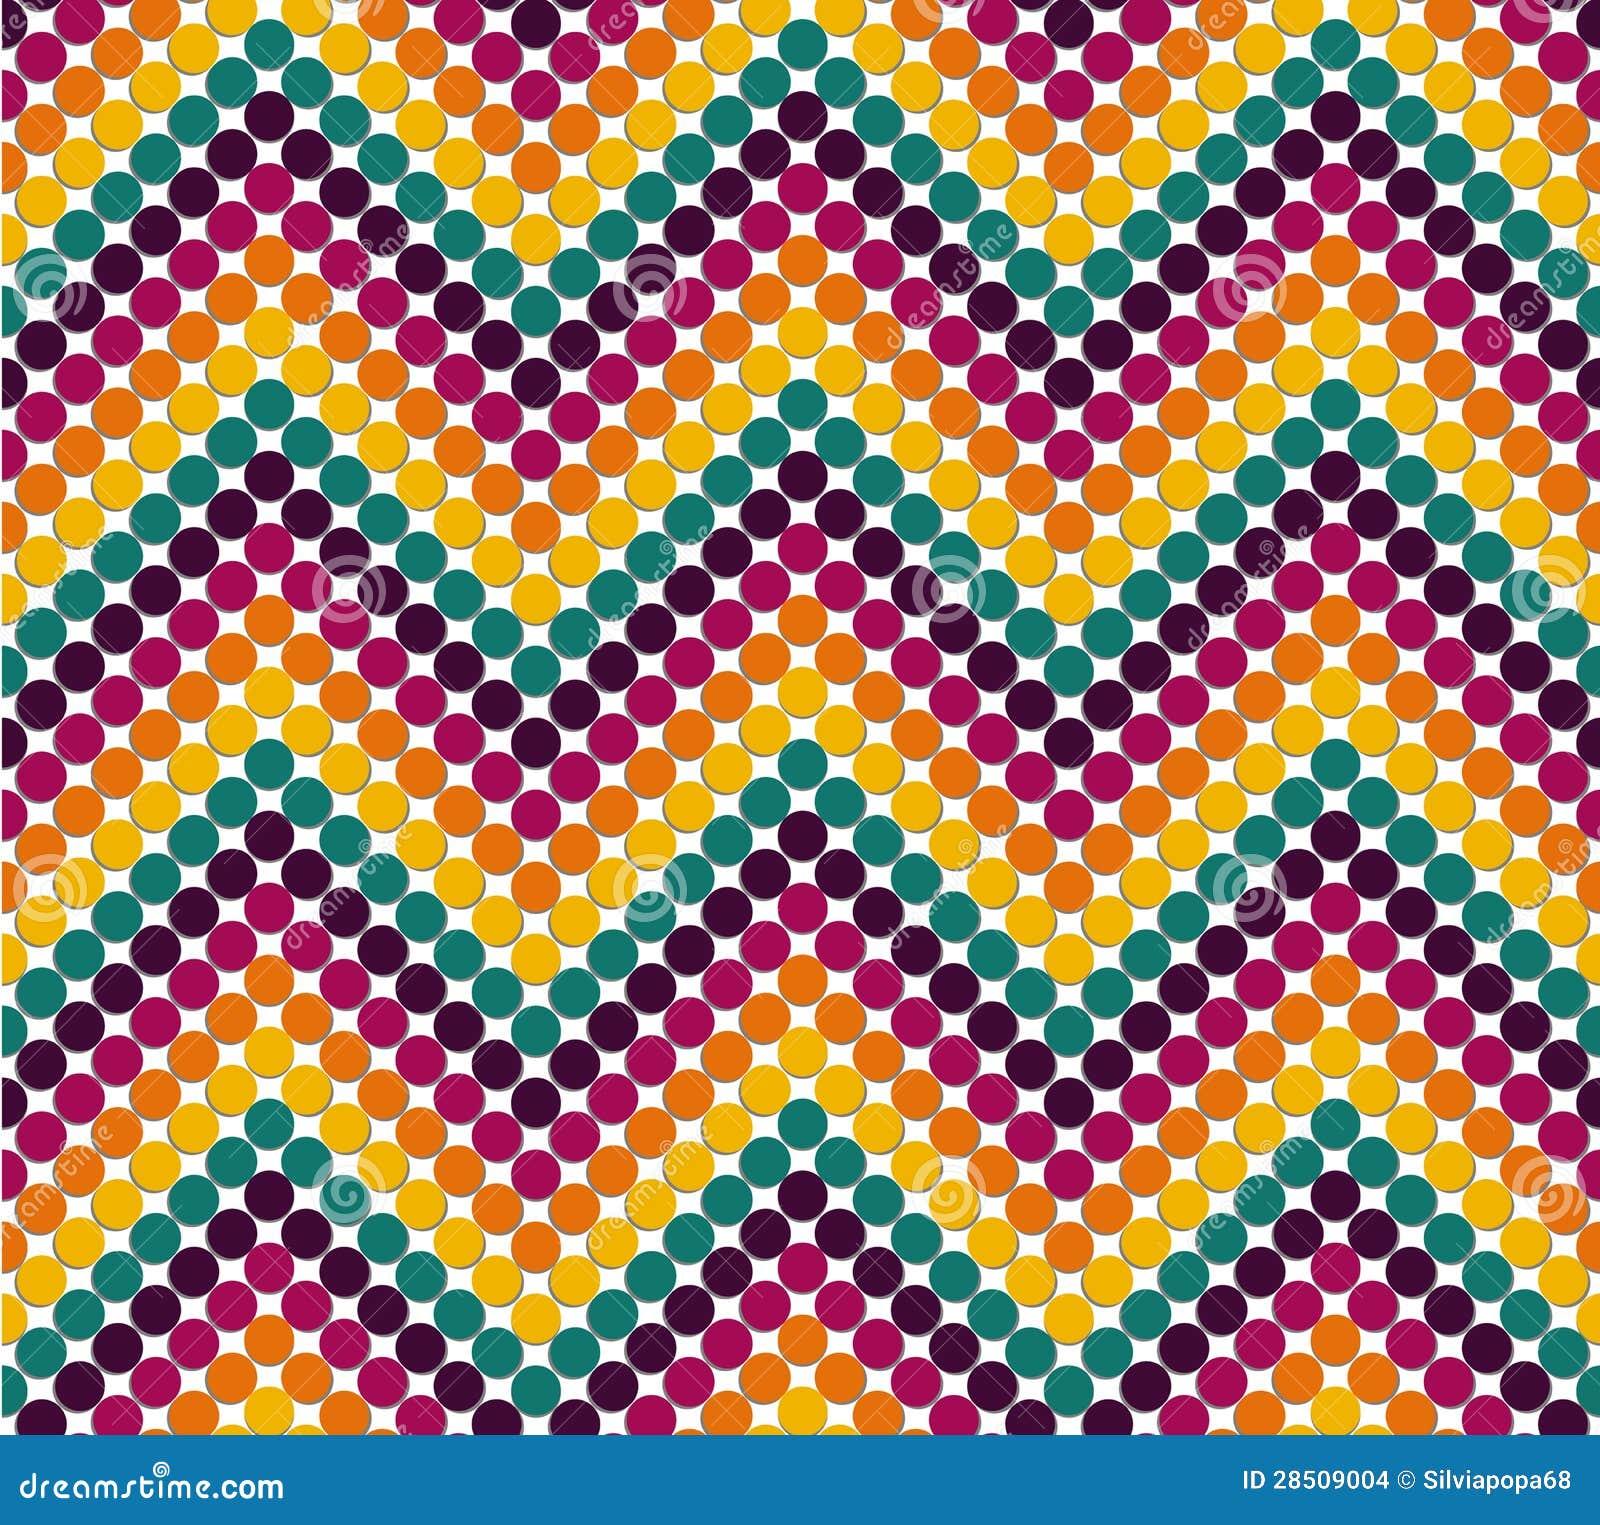 zigzag pattern in cute color stock illustration illustration of illusion retro 28509004. Black Bedroom Furniture Sets. Home Design Ideas